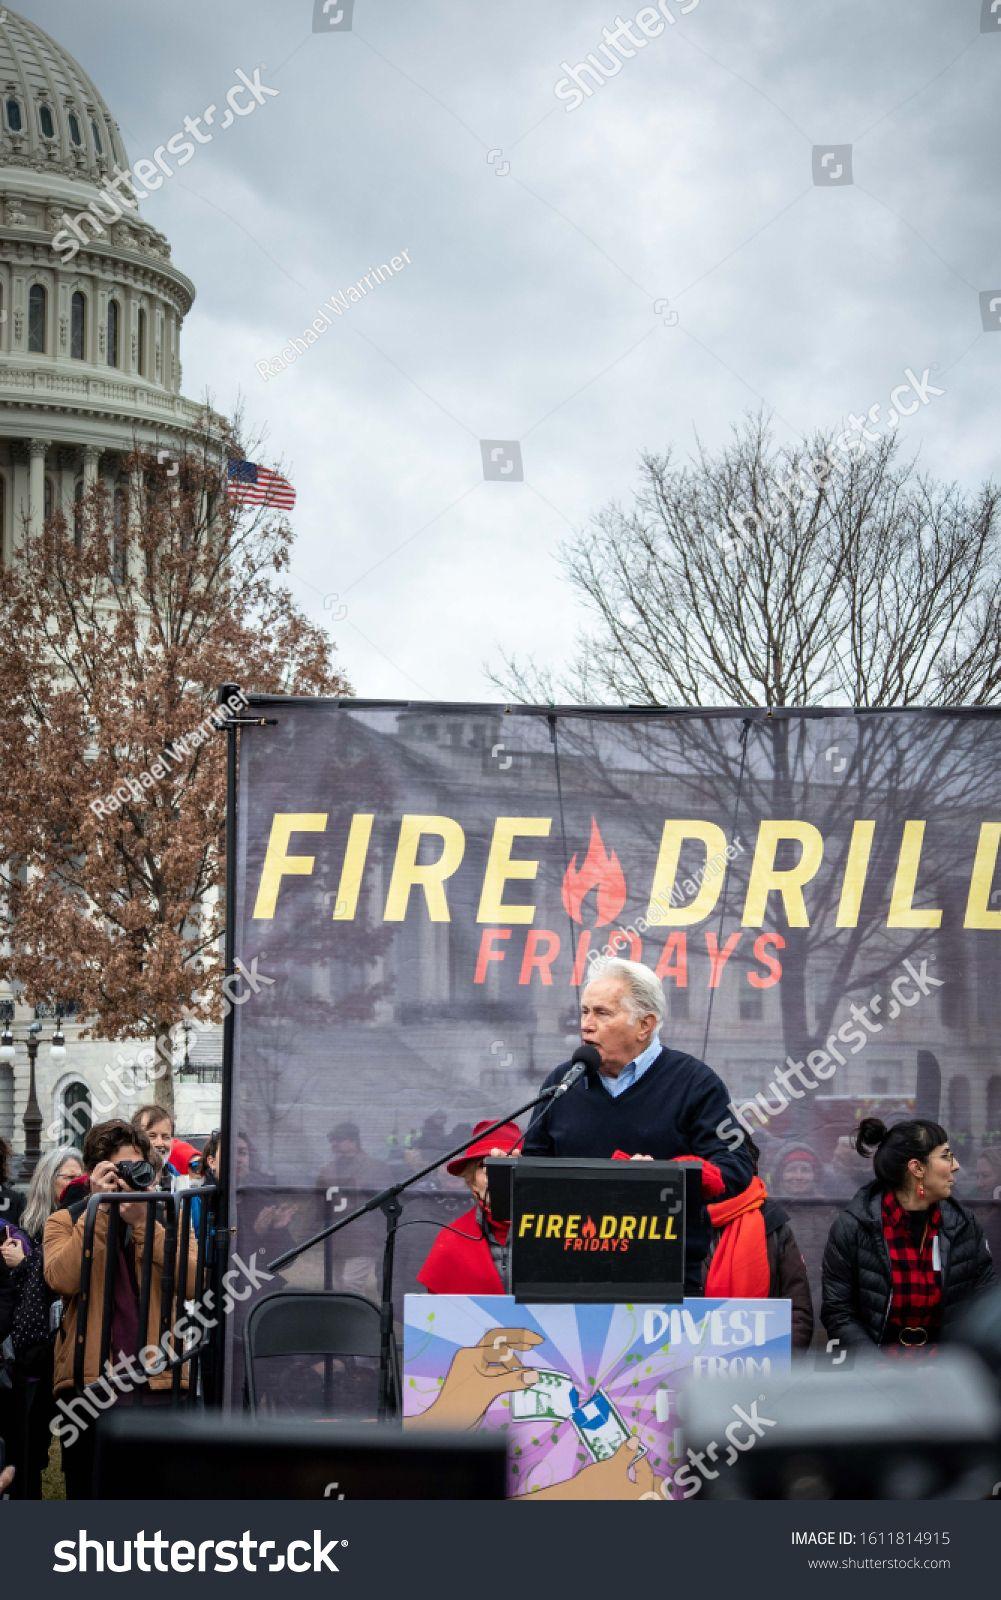 Washington Dc U002f Usa January 10 2020 Celebrities Join Hundreds Of Protesters At Jane Fonda S Final Fire Drill Spo Photo Editing Stock Photos Fire Drill